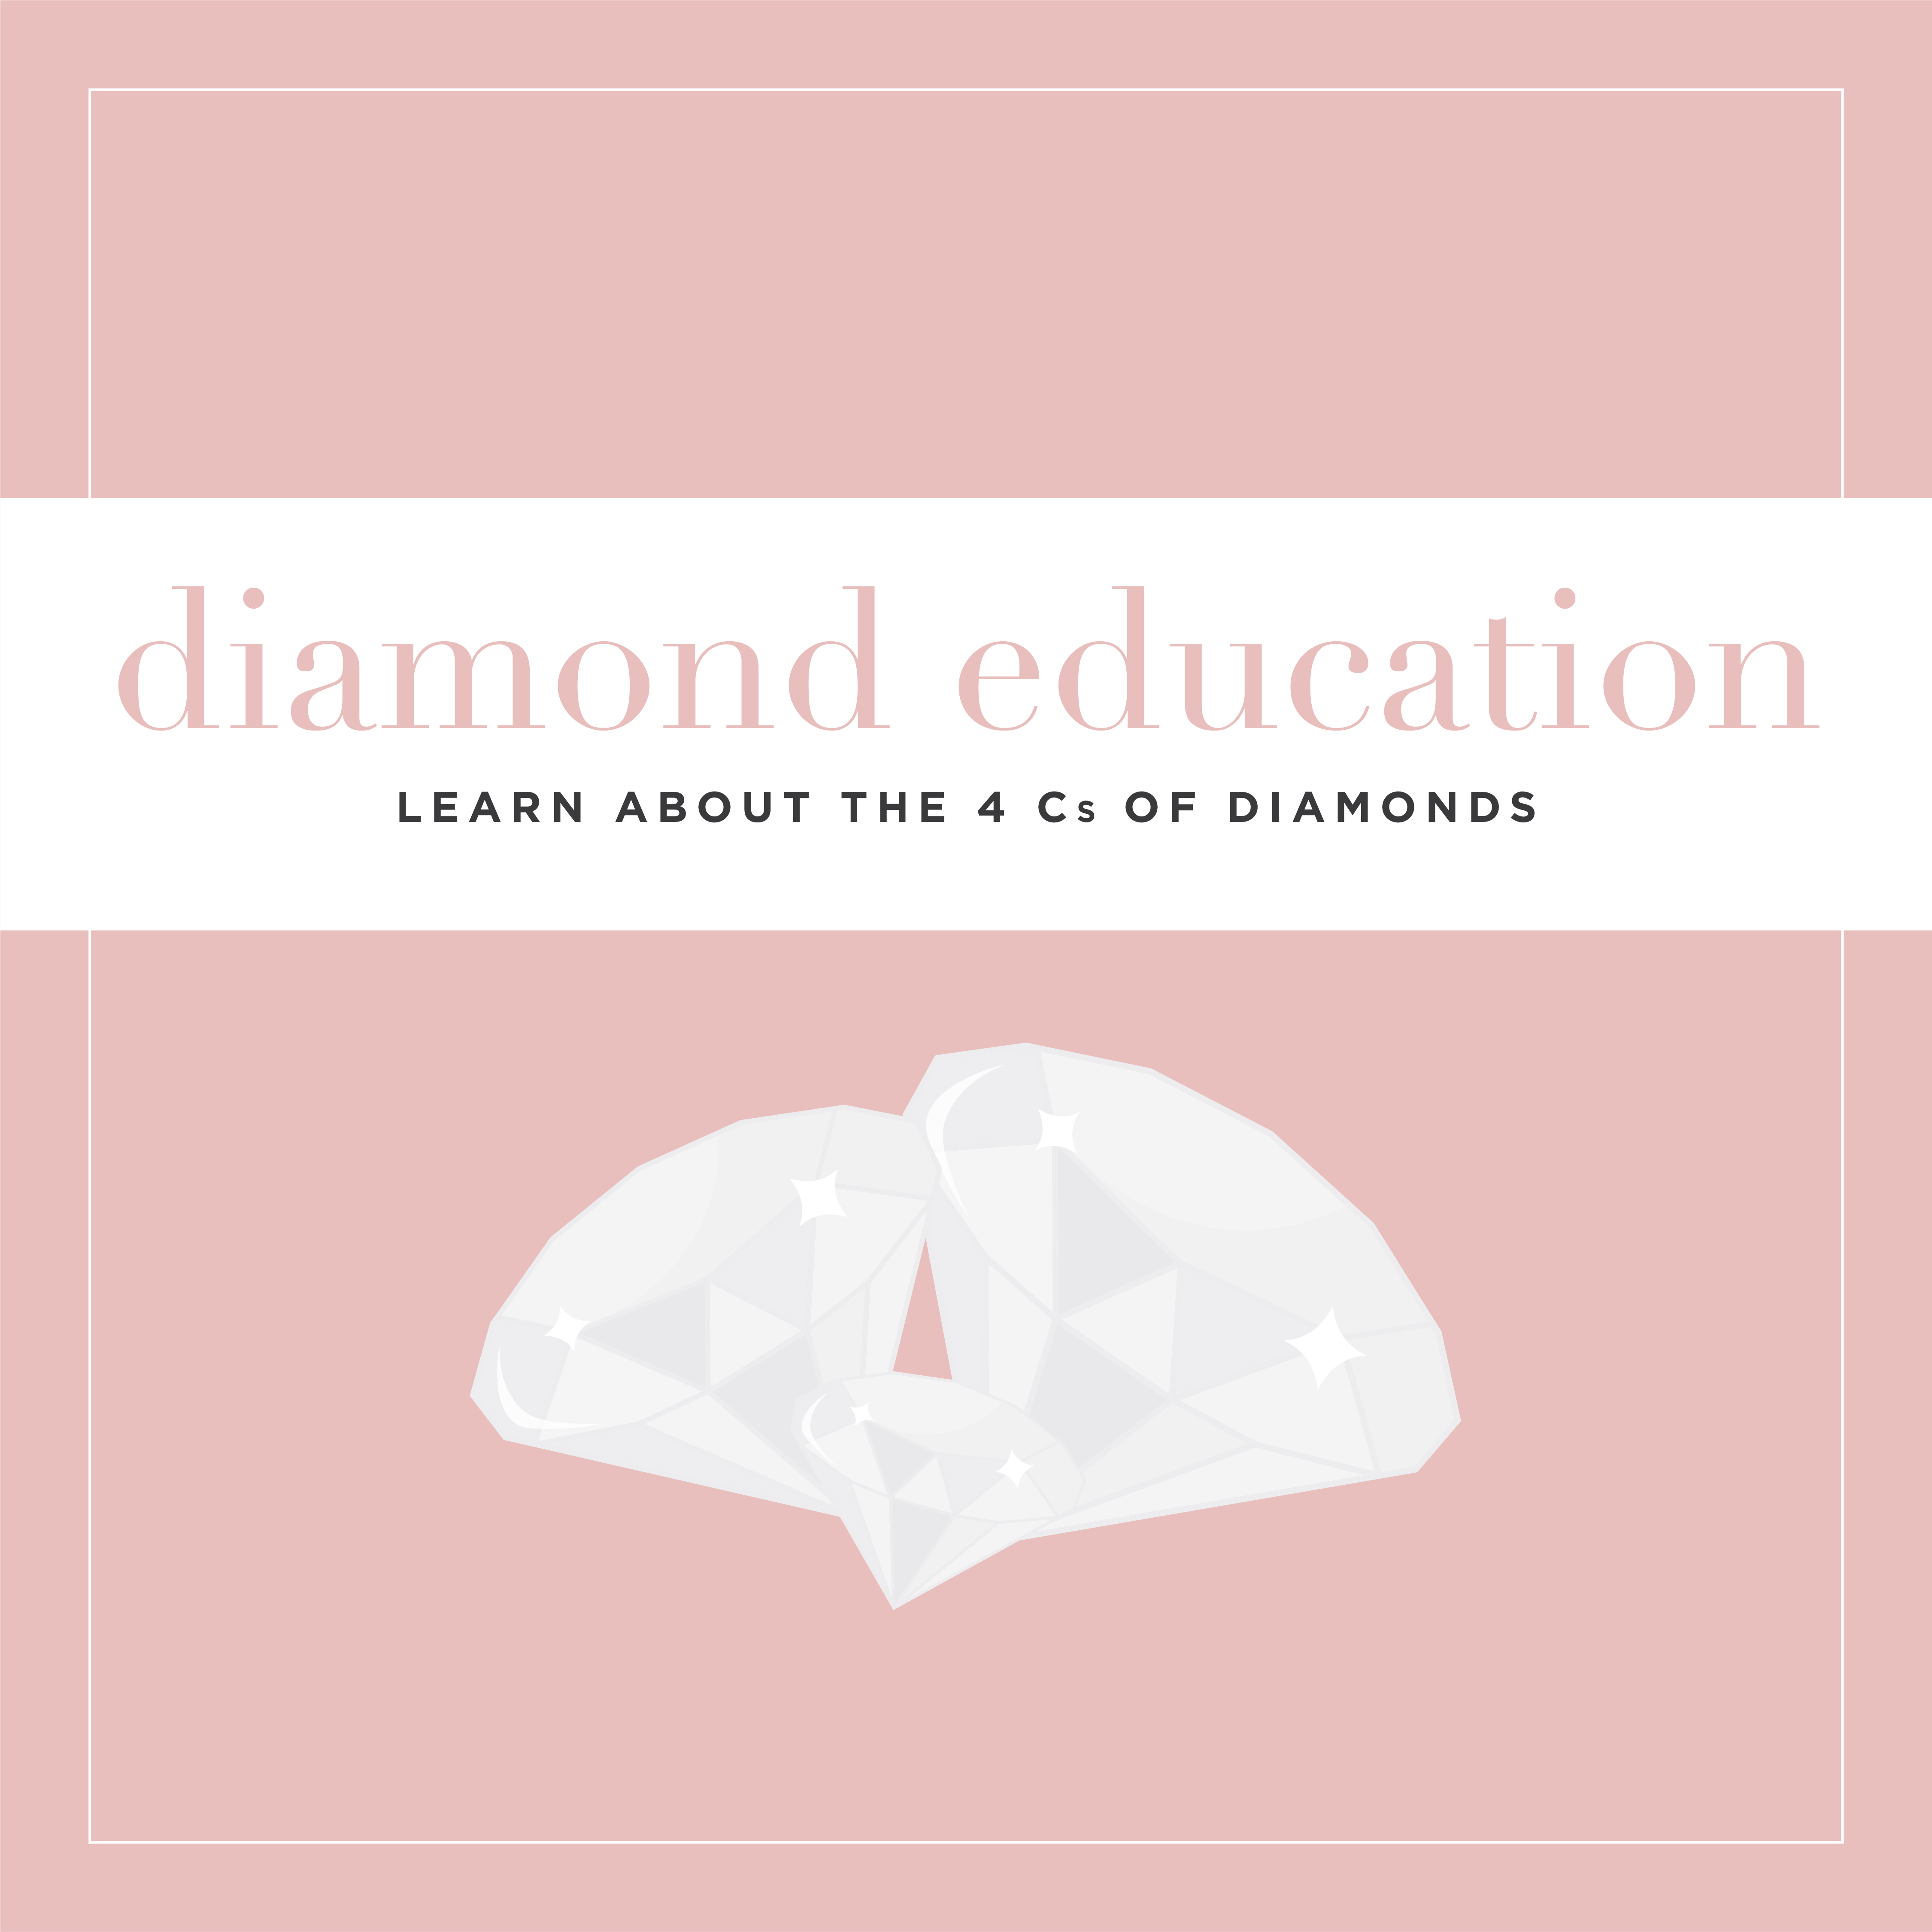 Diamond Education Infographic_Grid 1